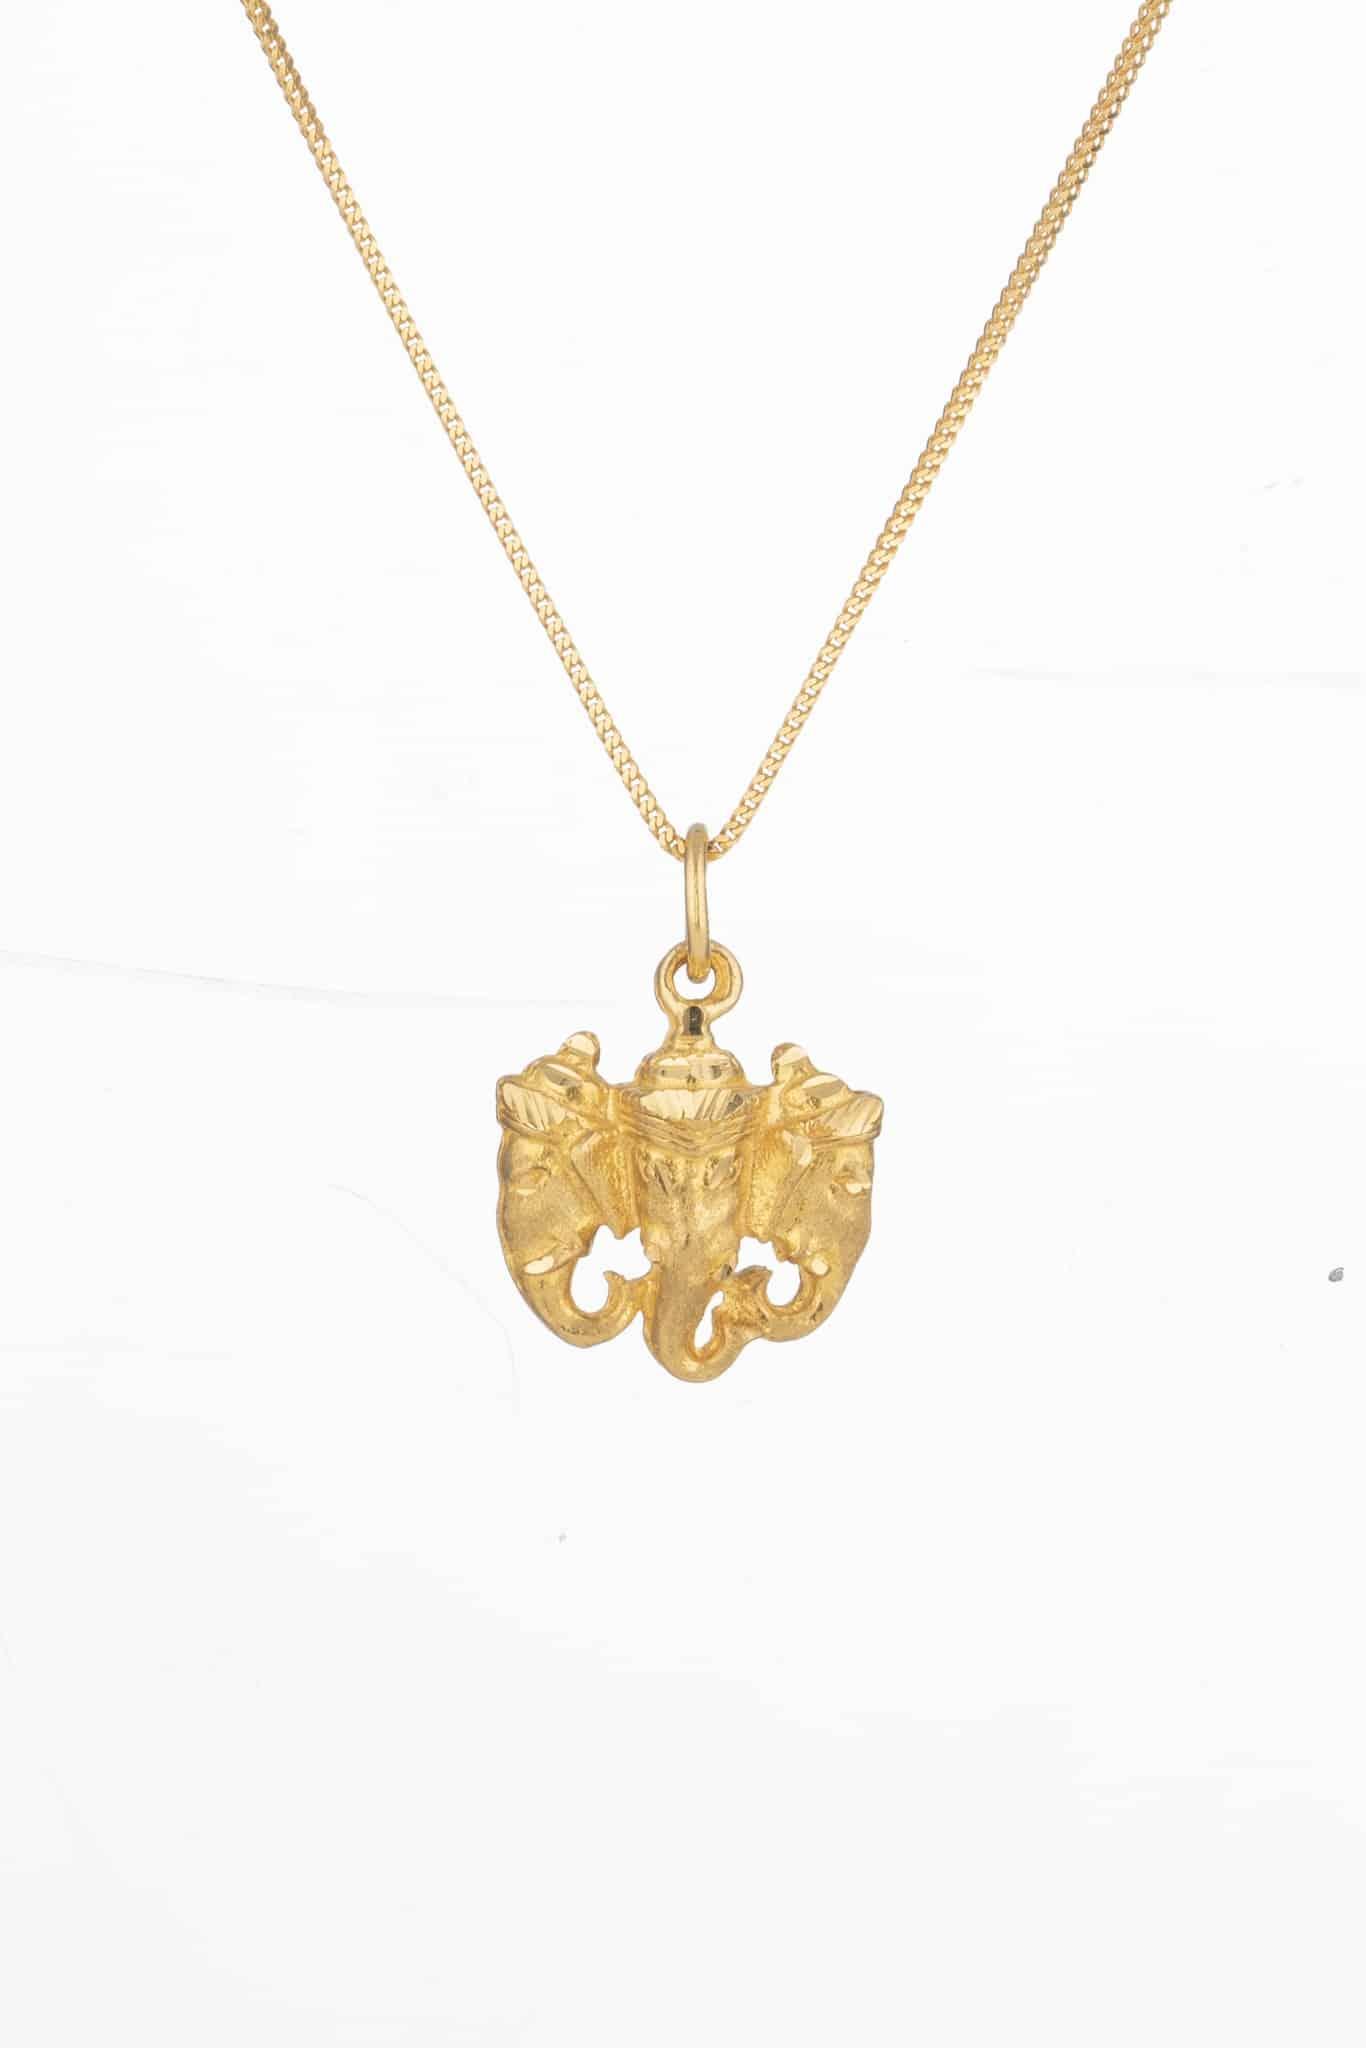 6026 - Ganesh Ji Gold Pendant